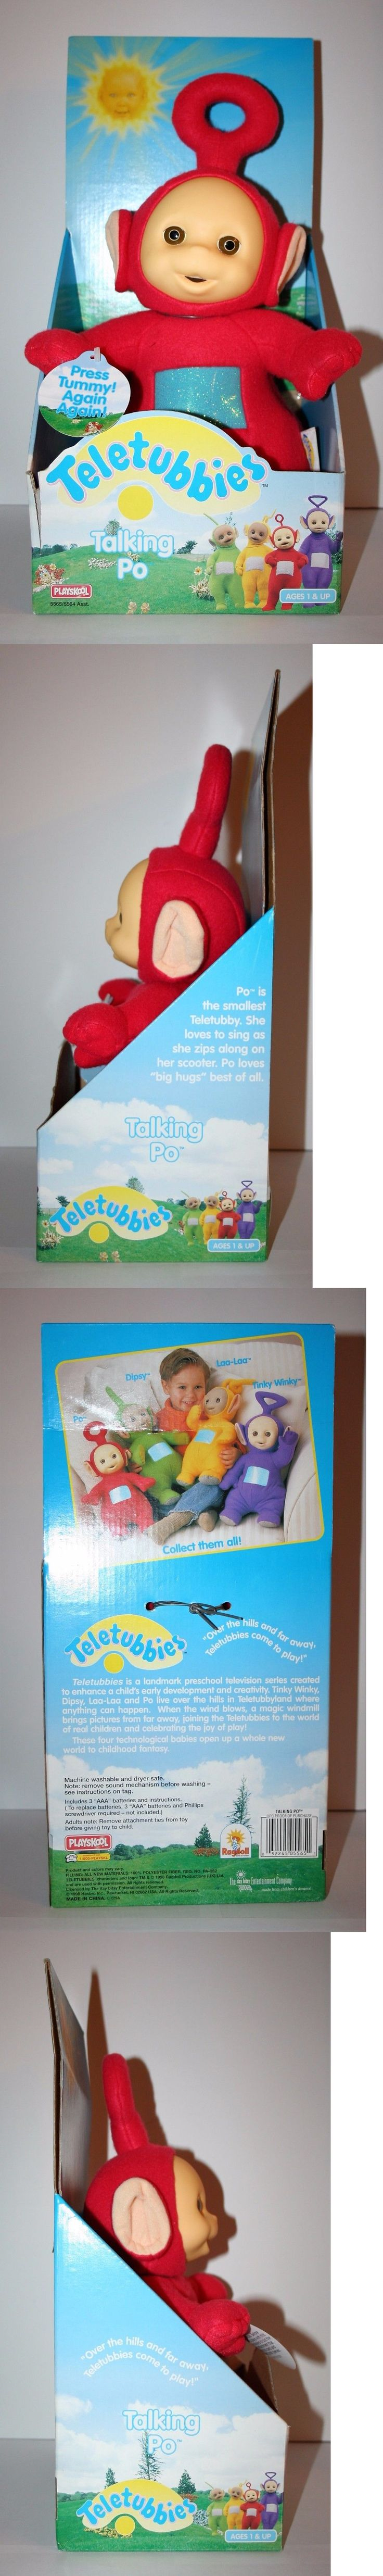 Teletubbies 756: Vintage 1998 Hasbro Playskool Teletubbies Talking Po Recalled Doll Nib New Rare -> BUY IT NOW ONLY: $50 on eBay!